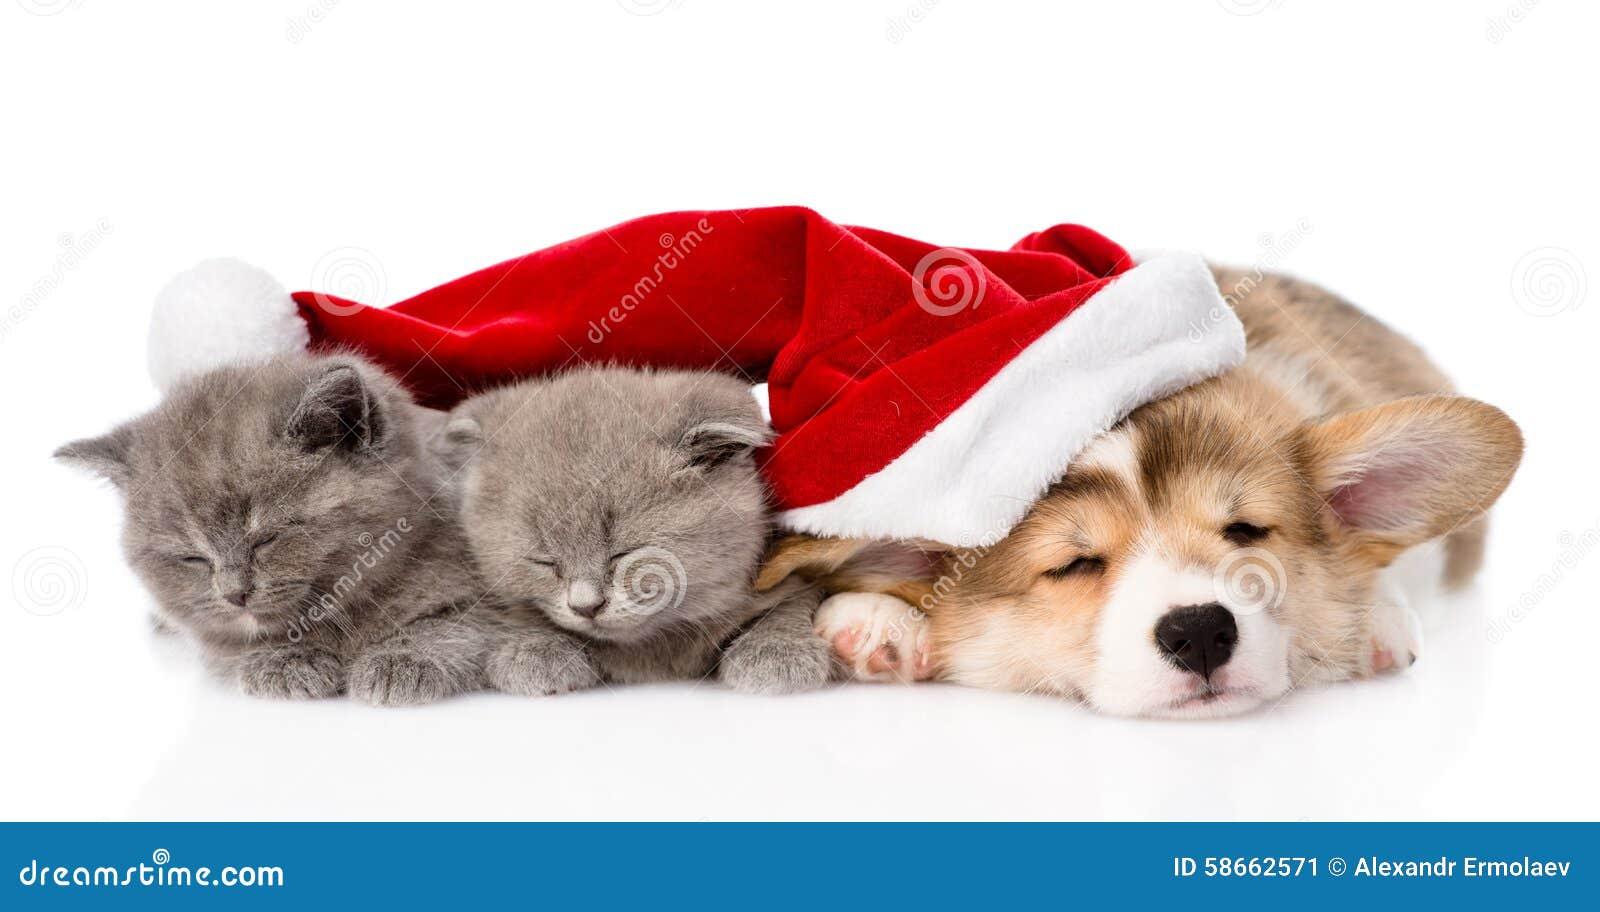 Sleeping pembroke welsh corgi puppy dog with santa hat and